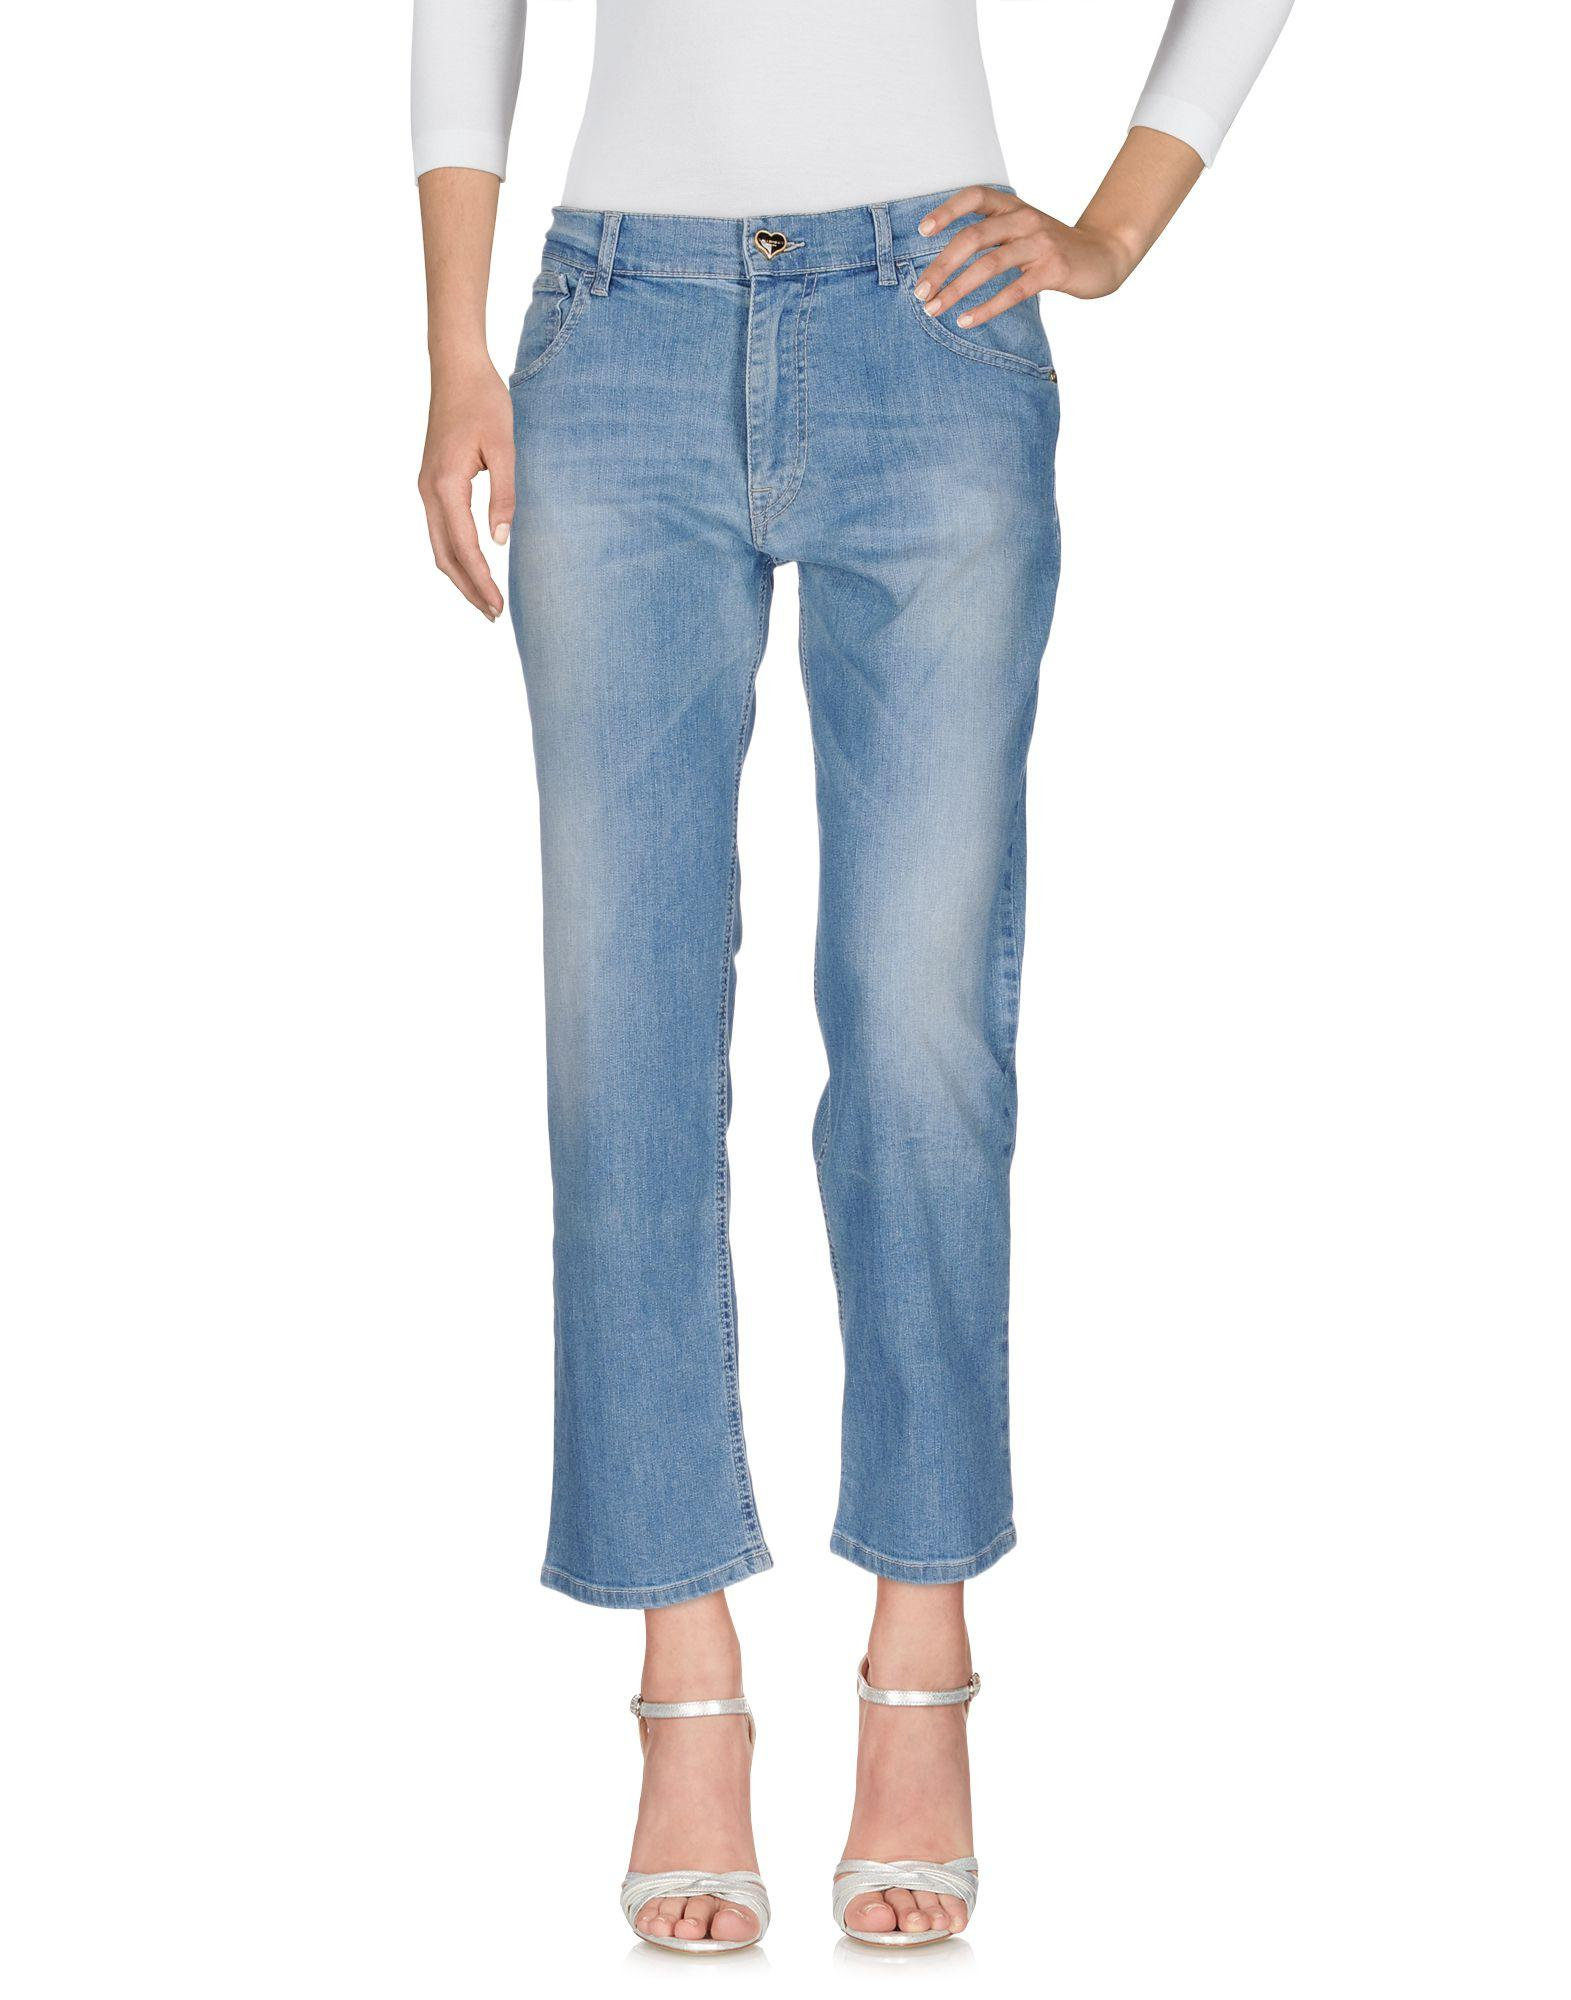 Twinset Denim Pants In Blue